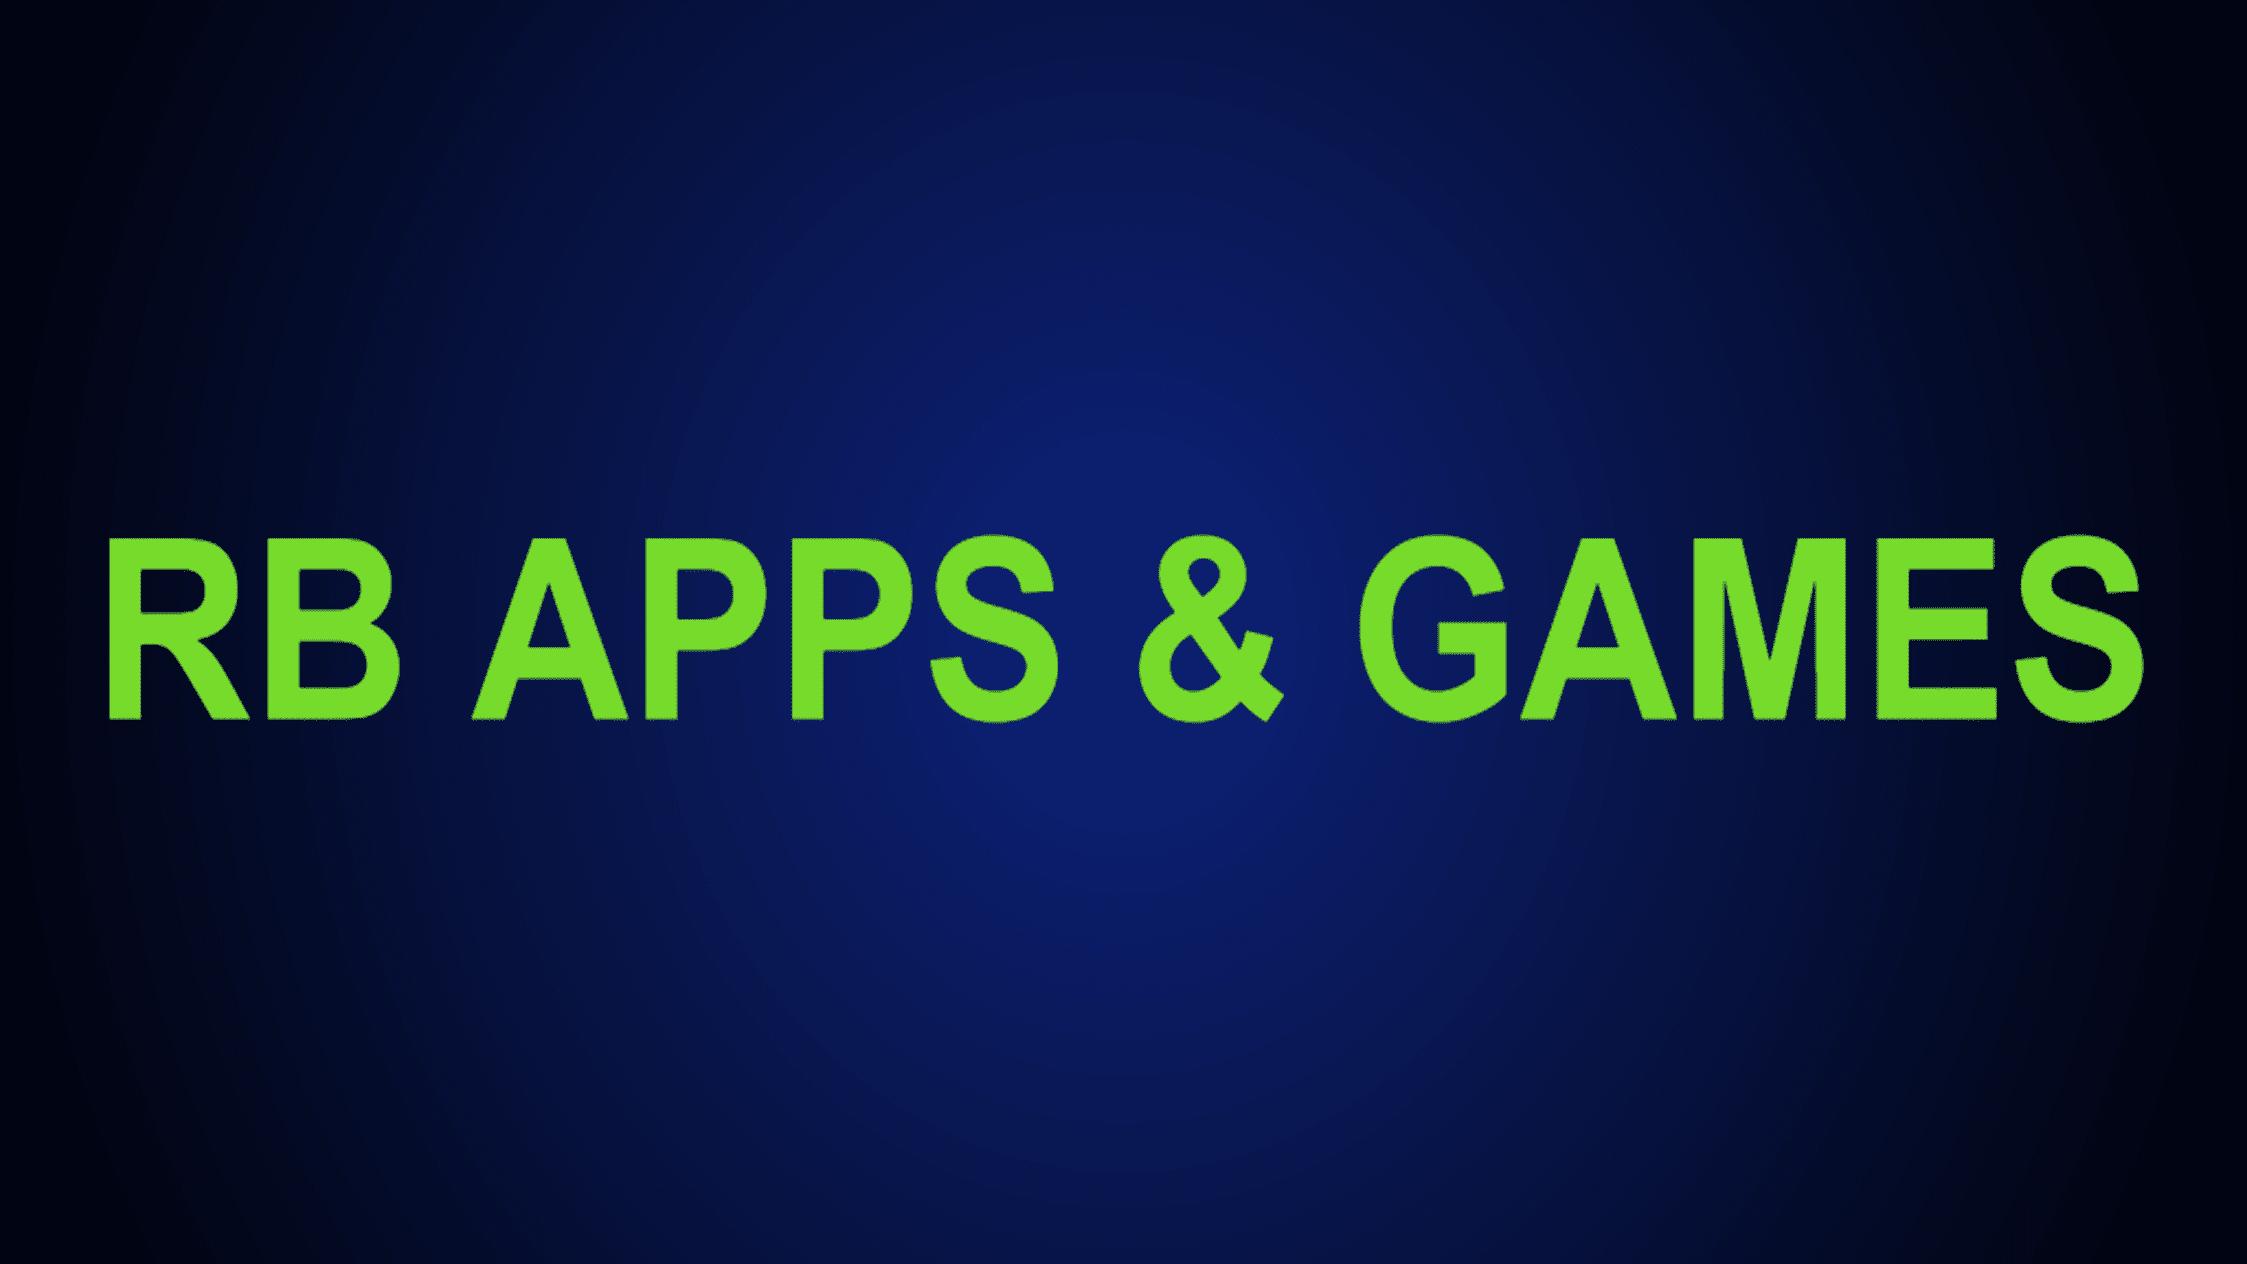 RB Apps & Games